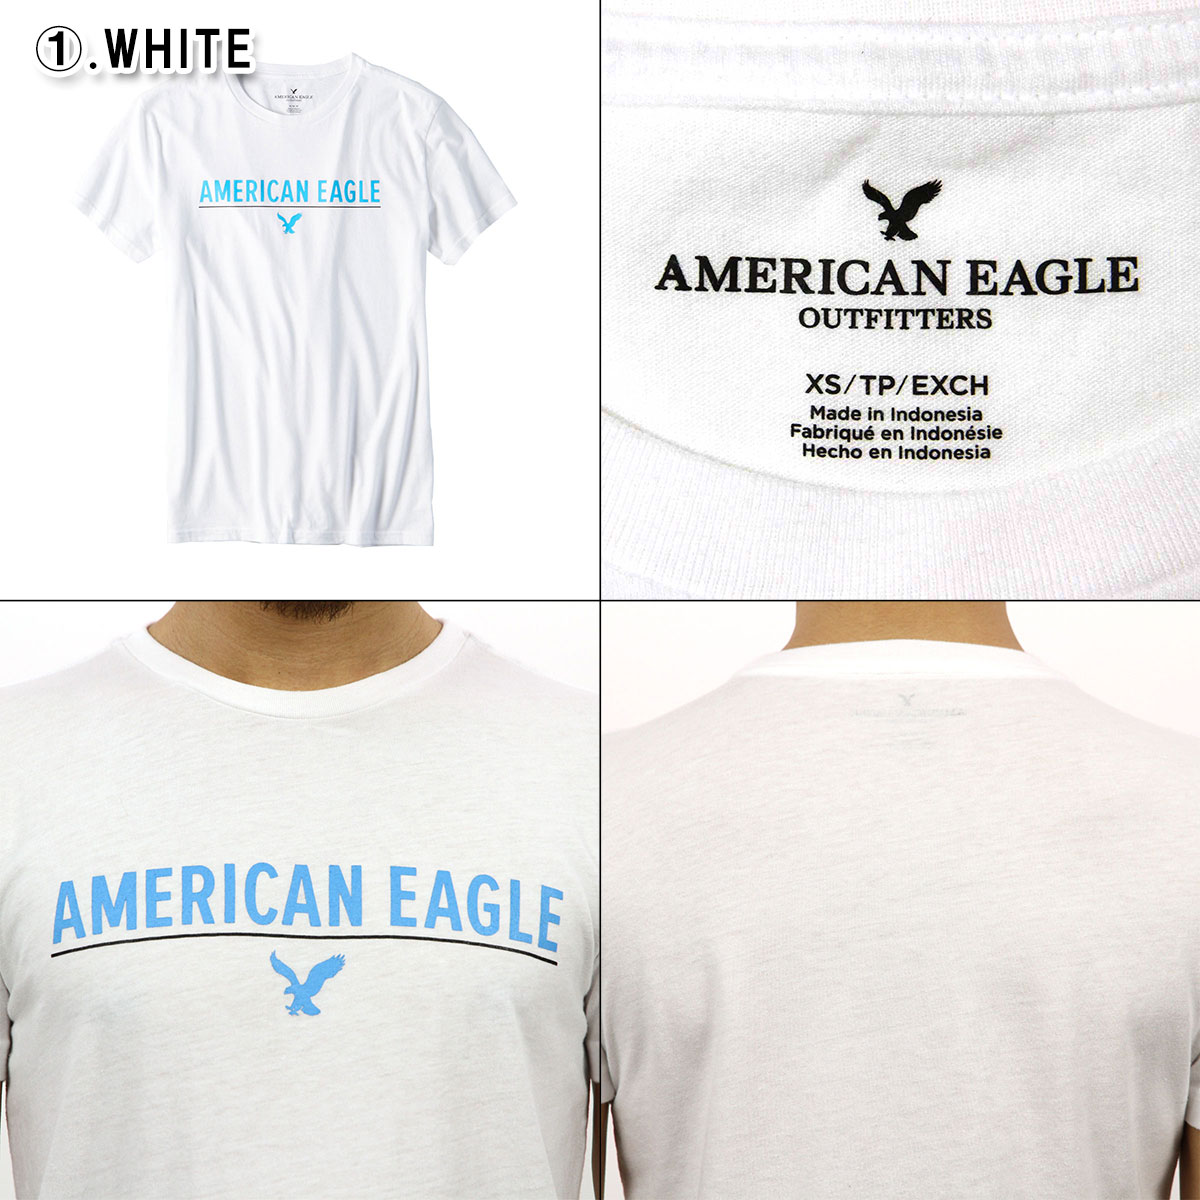 MENS AMERICAN EAGLE AE GRAPHIC T-SHIRT Guys White  XS  Tee